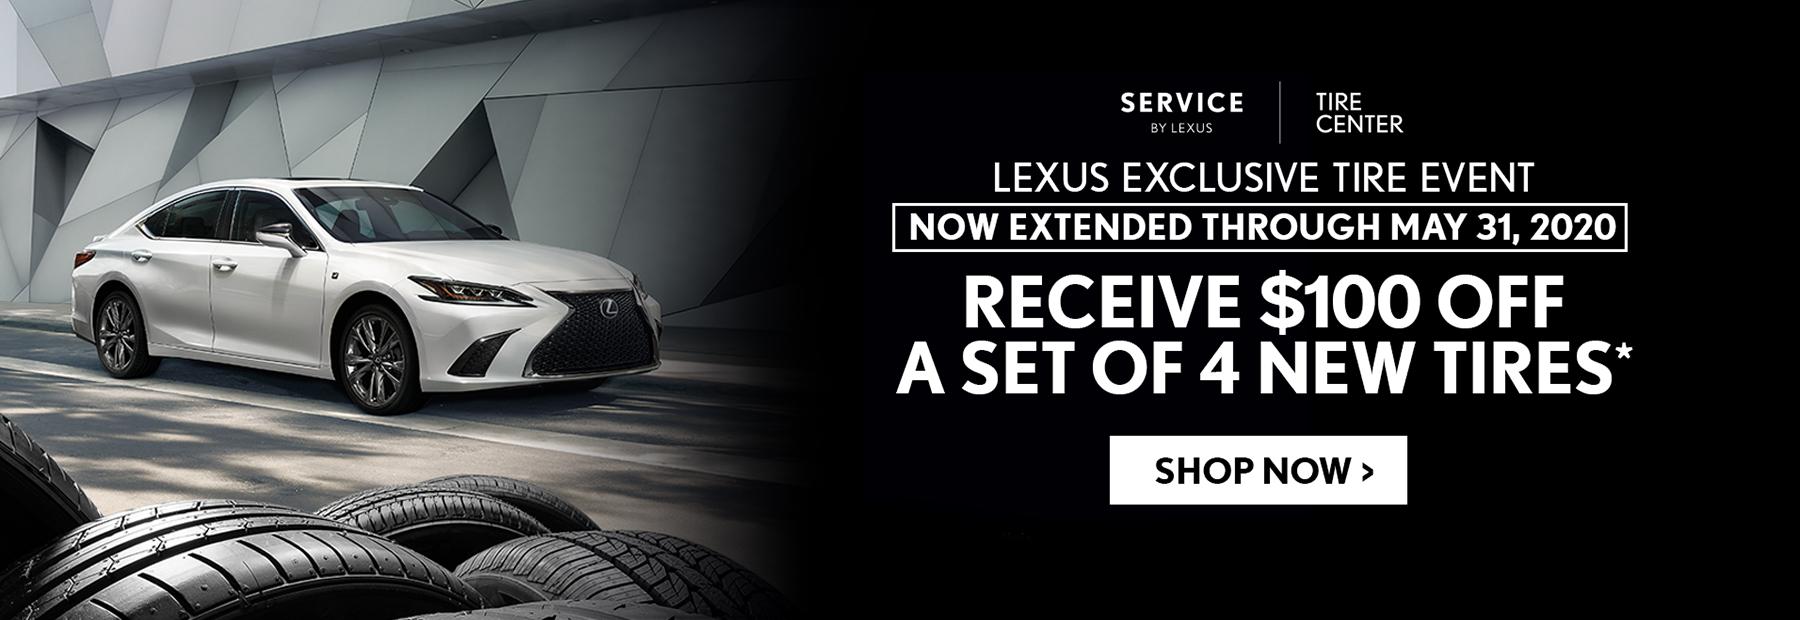 performance-lexus-rivercenter-tire-event-save-100-dollars